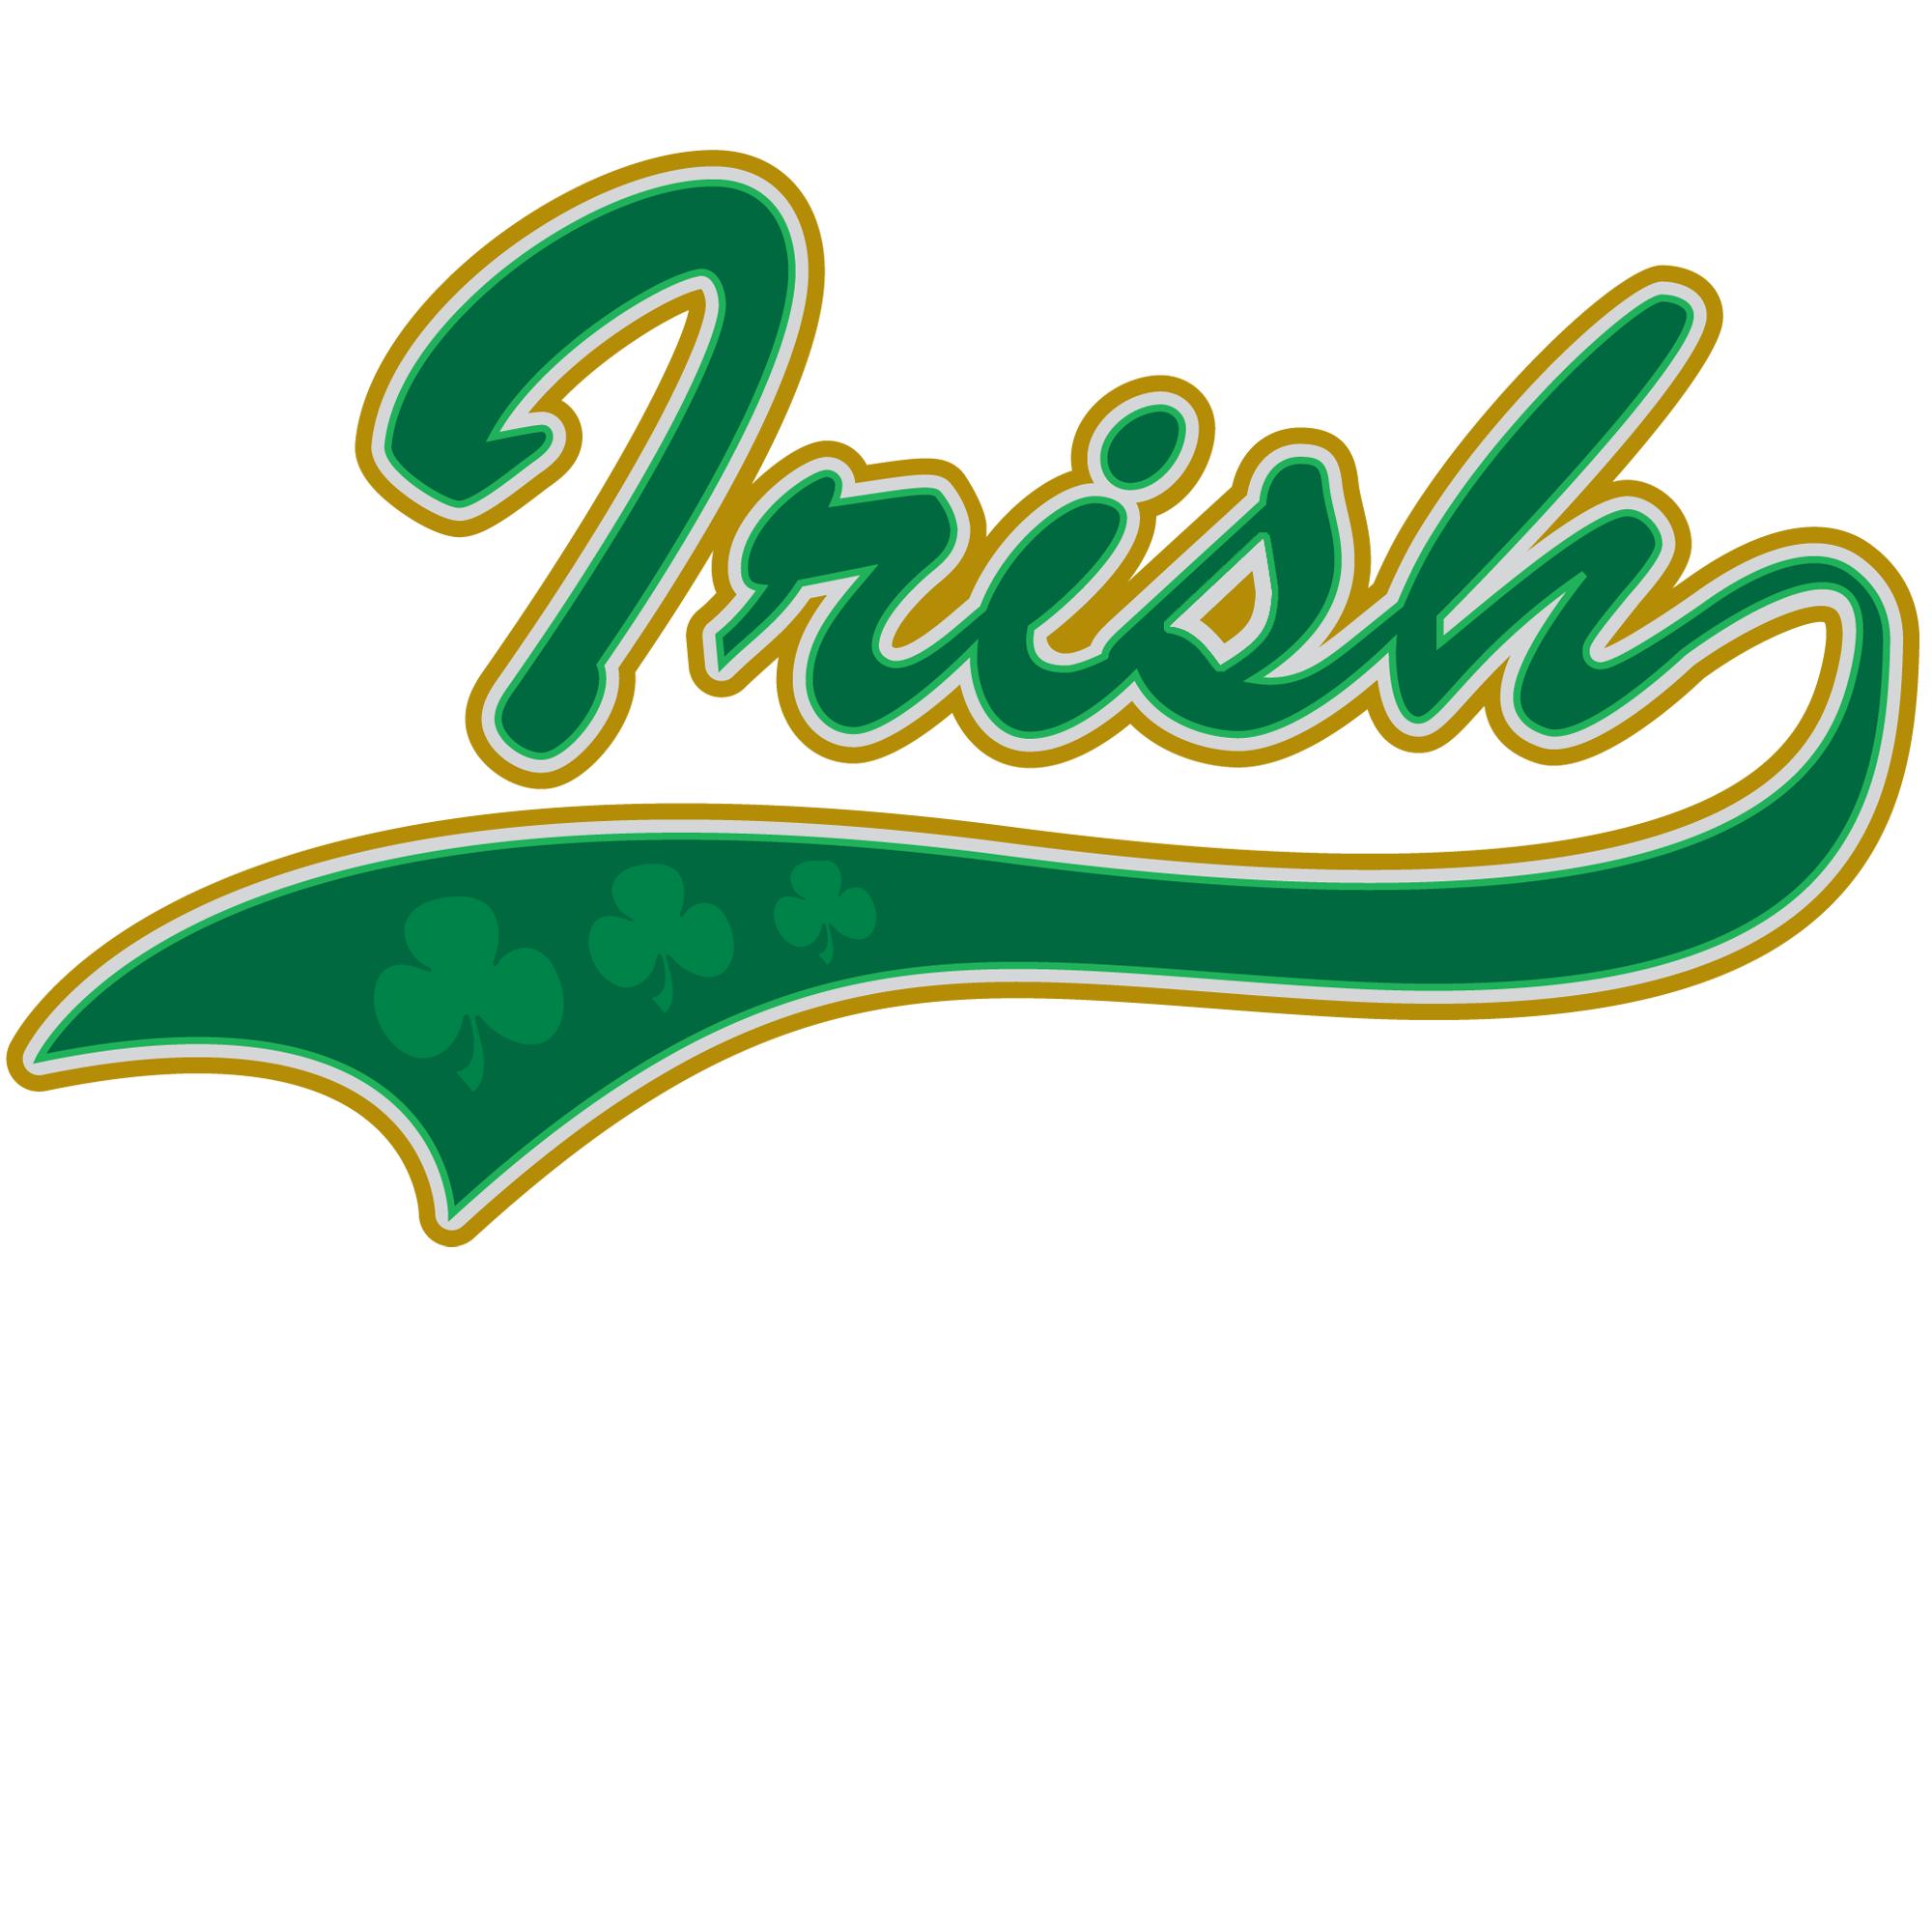 IrishBaseballDkwht.png PlusPng.com  - Irish PNG